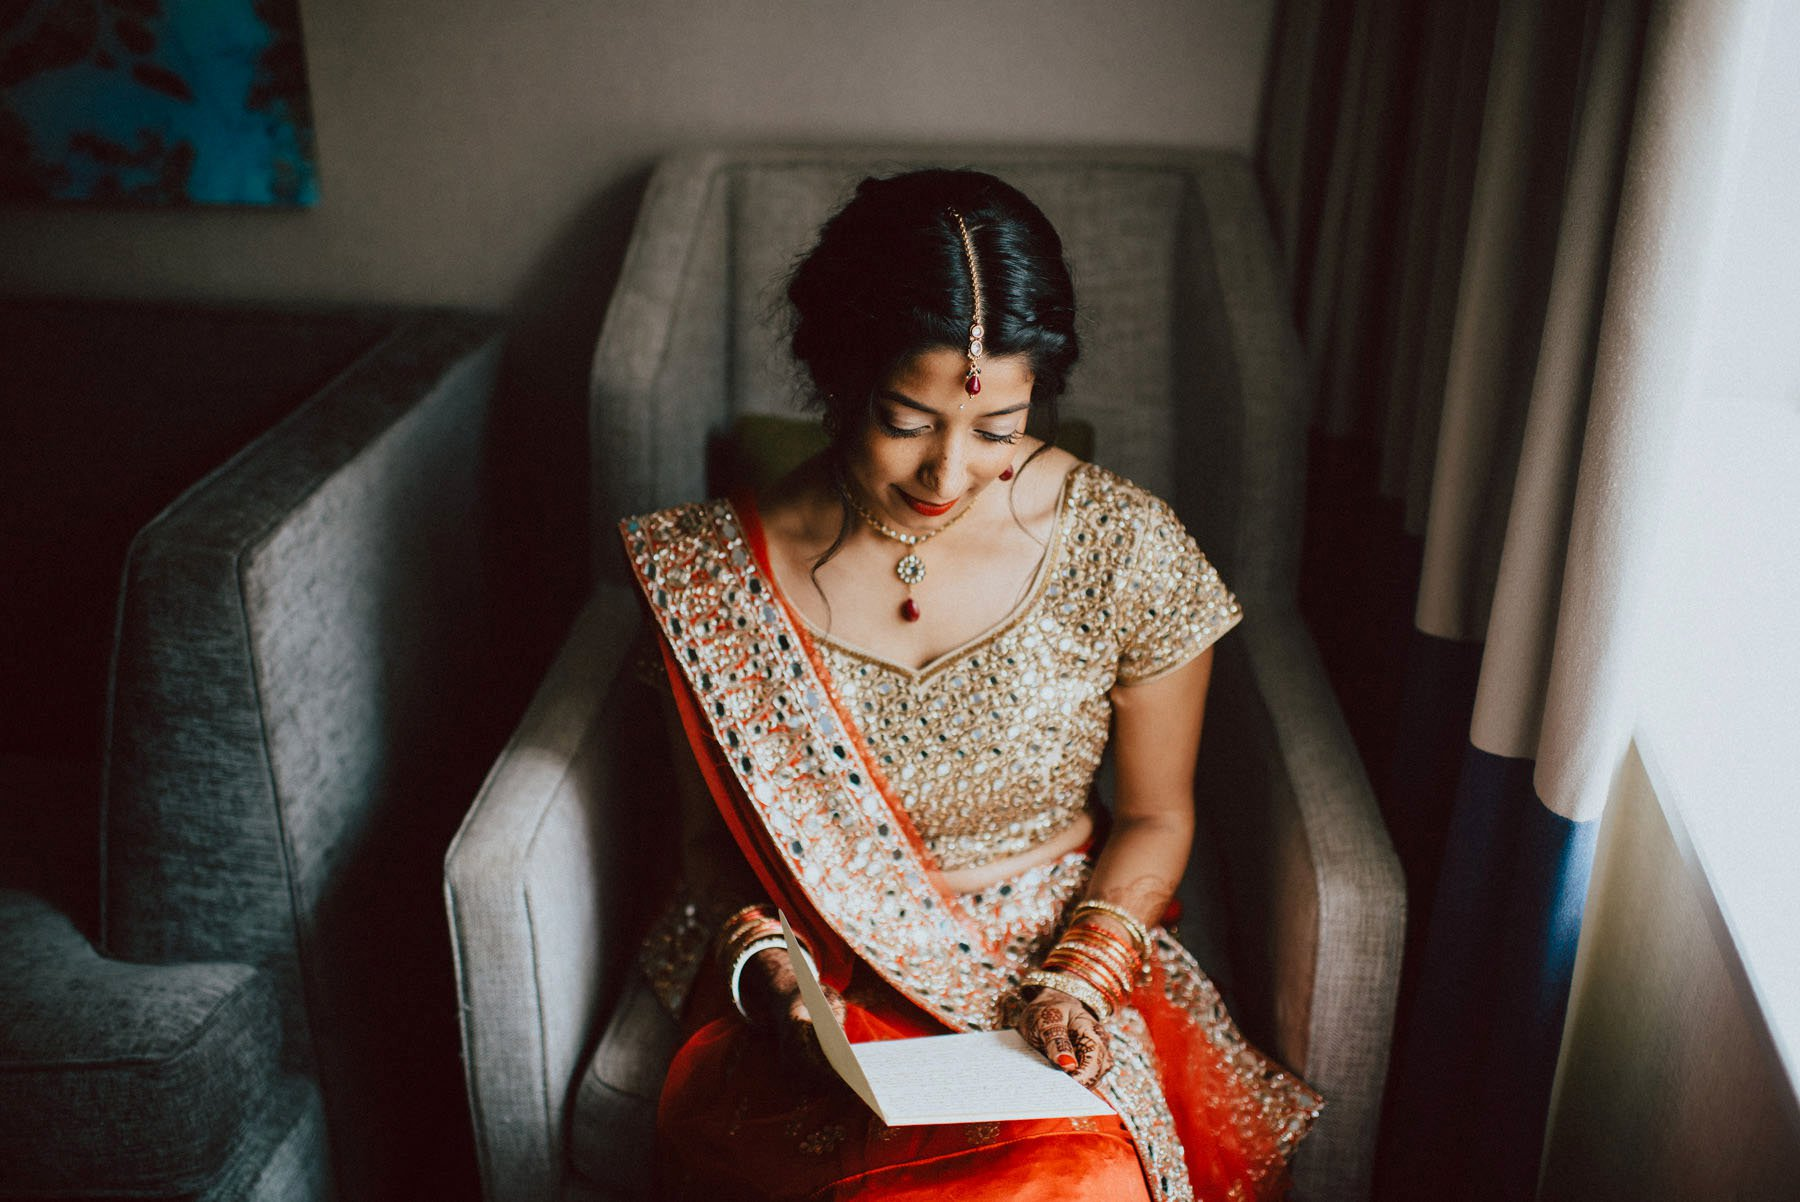 vie-philadelphia-indian-wedding-27.jpg